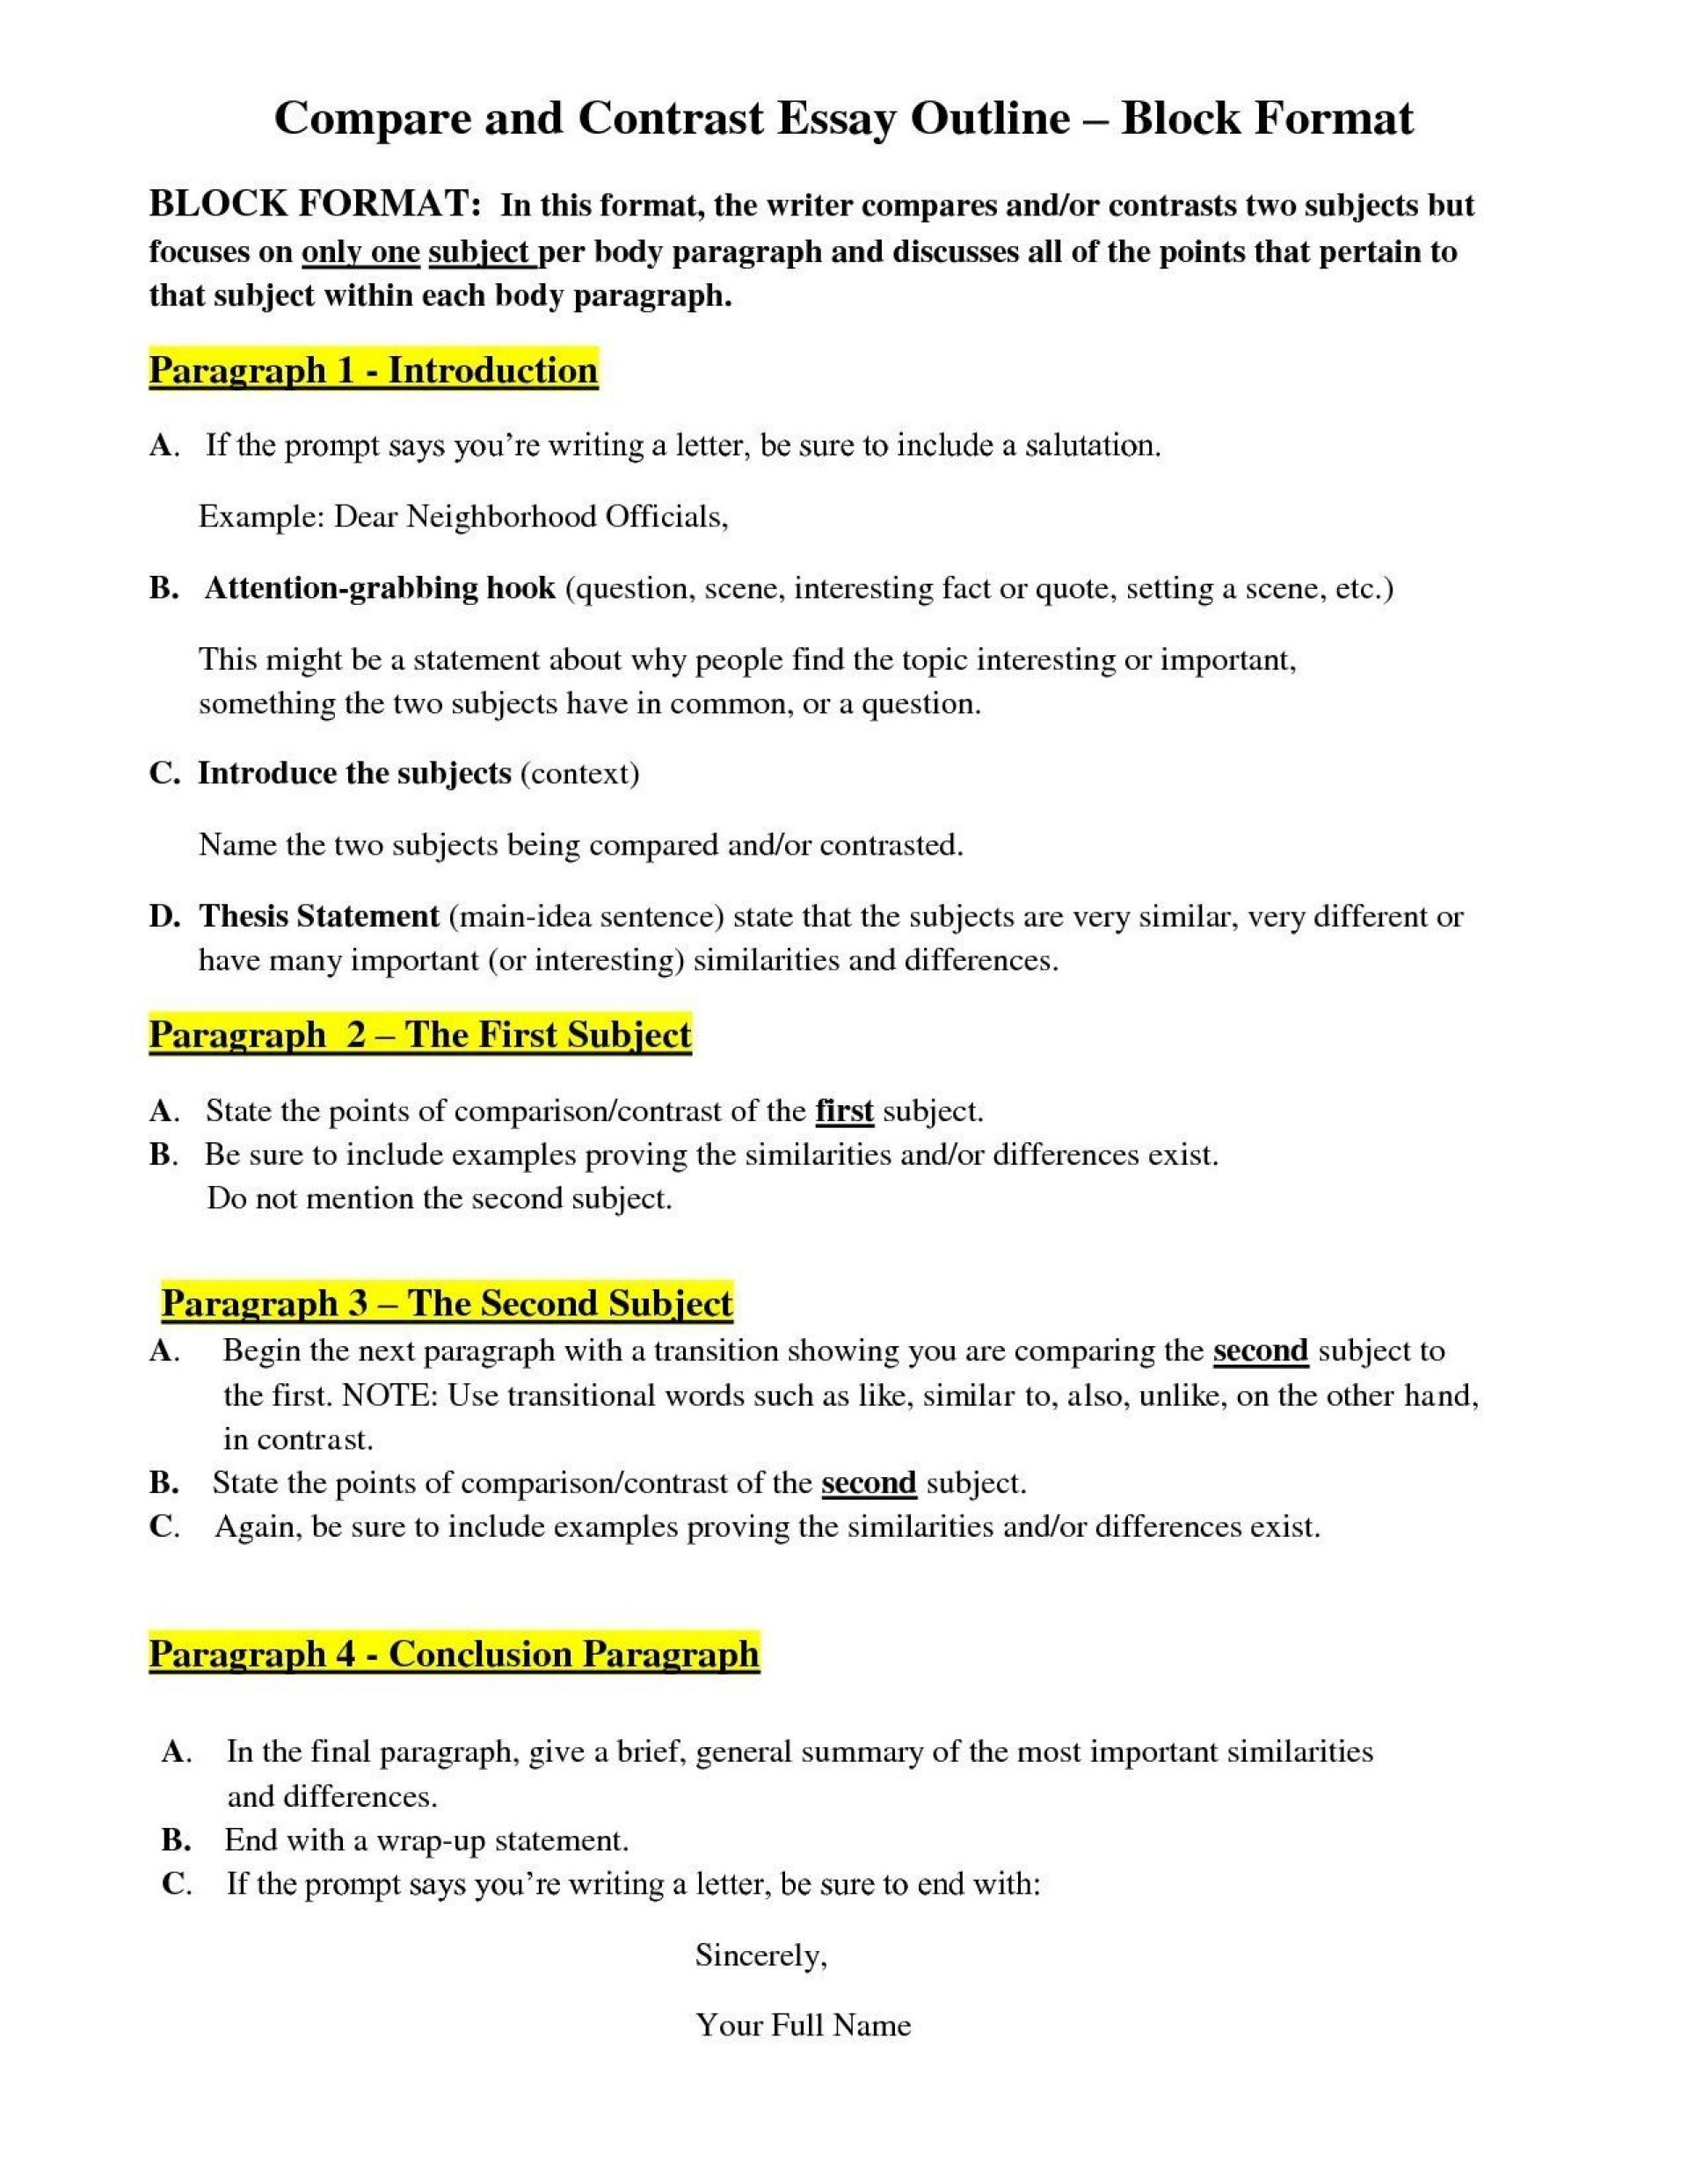 003 Comparison Essay Outline Unusual Example Sample Pdf 1920